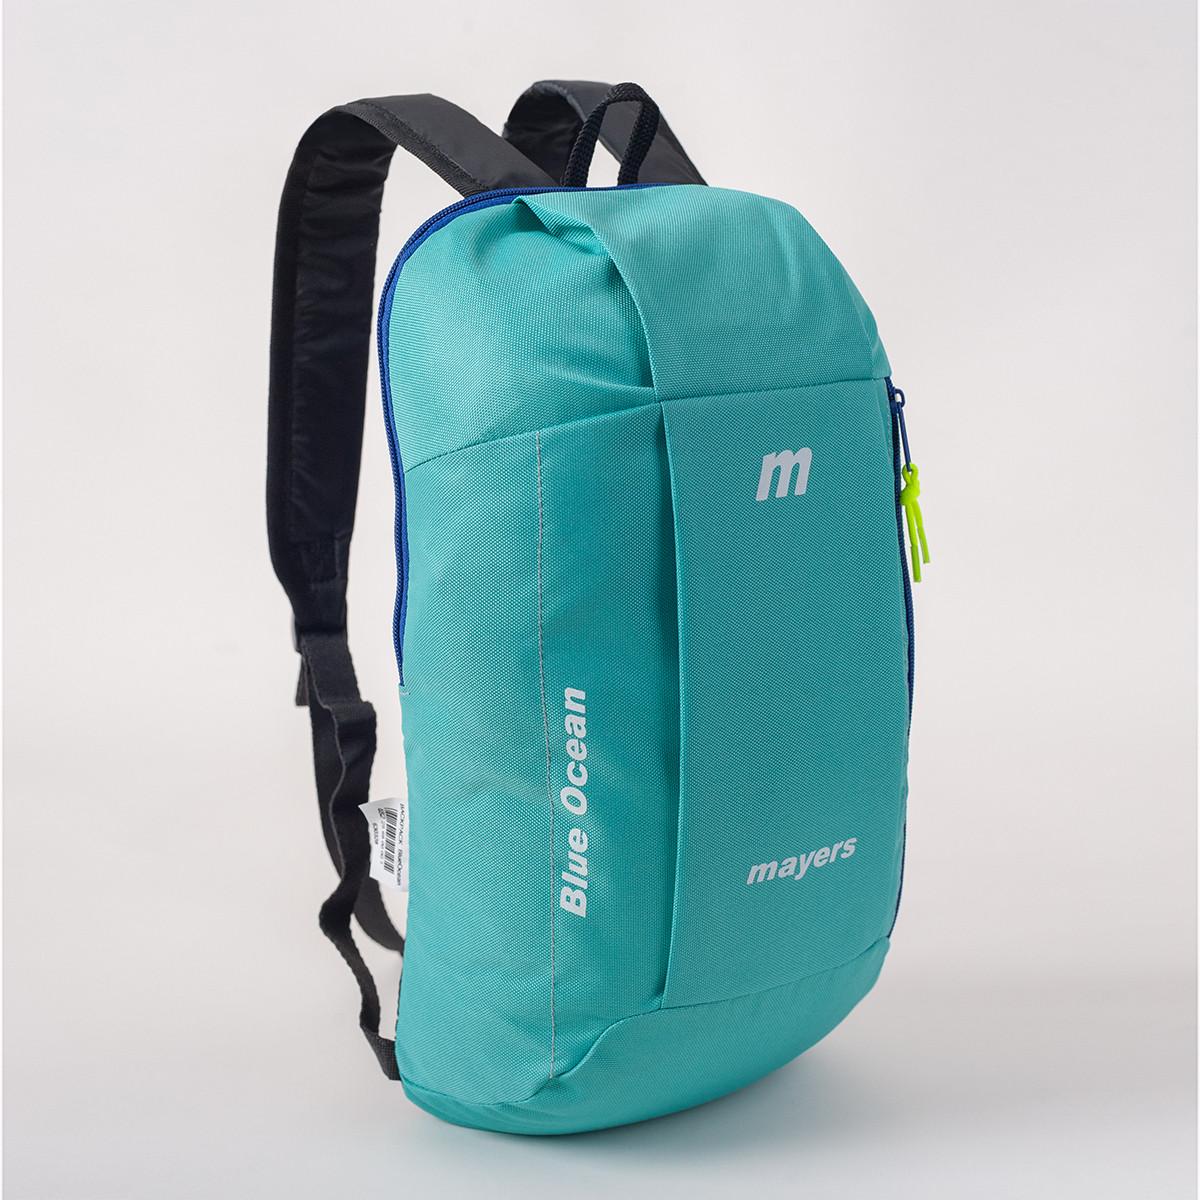 Спортивный рюкзак MAYERS 10L, бирюзовый, фото 2